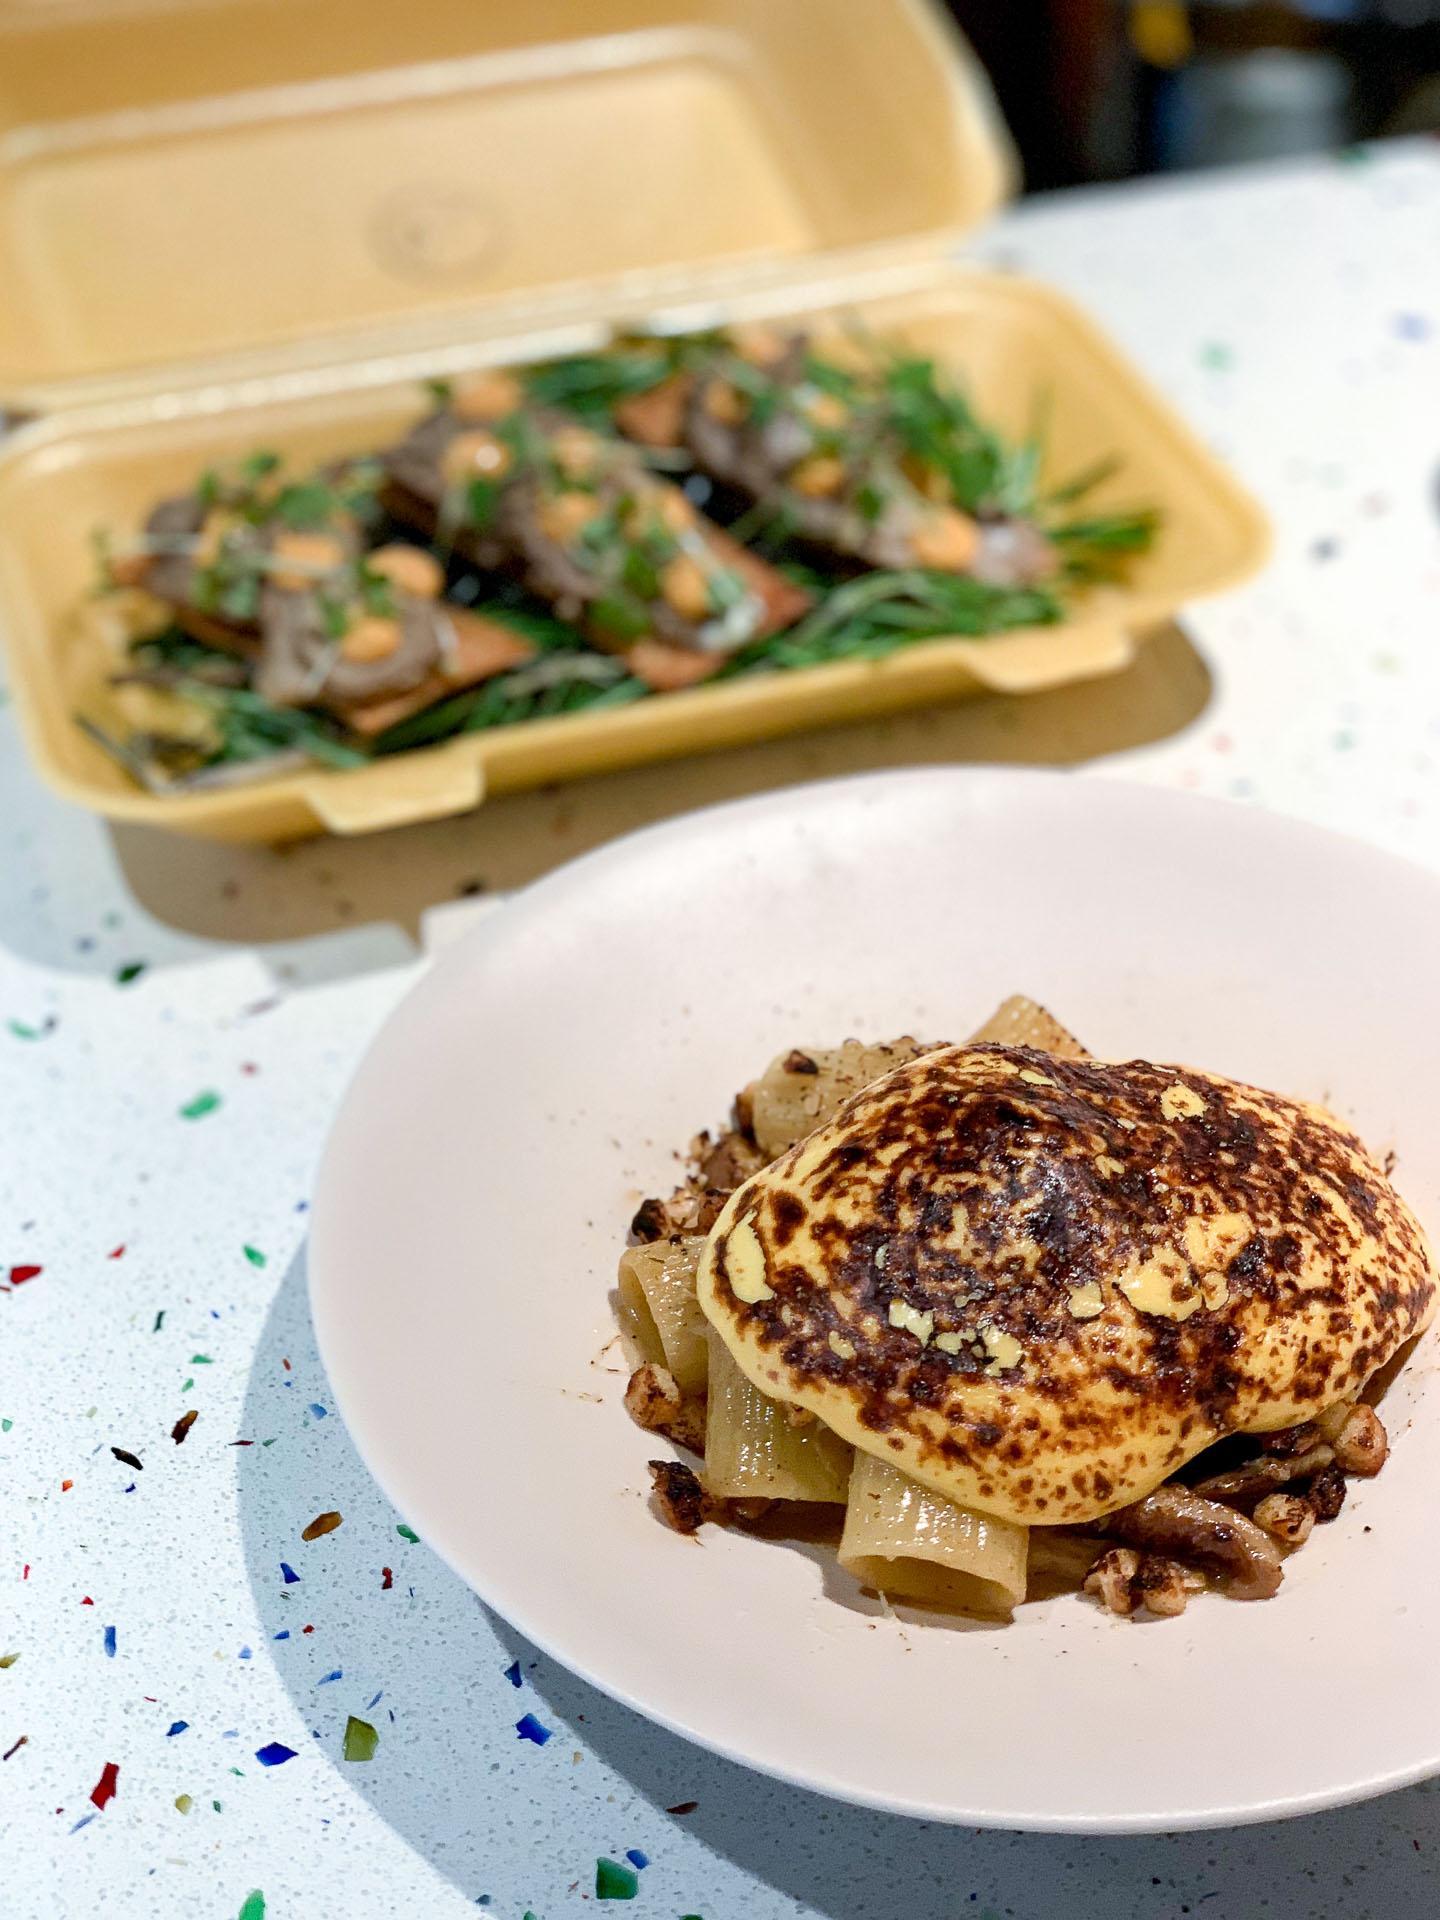 Mac' and cheese et kebab réinventés avec maestria chez Mr. T © MB/YONDER.fr